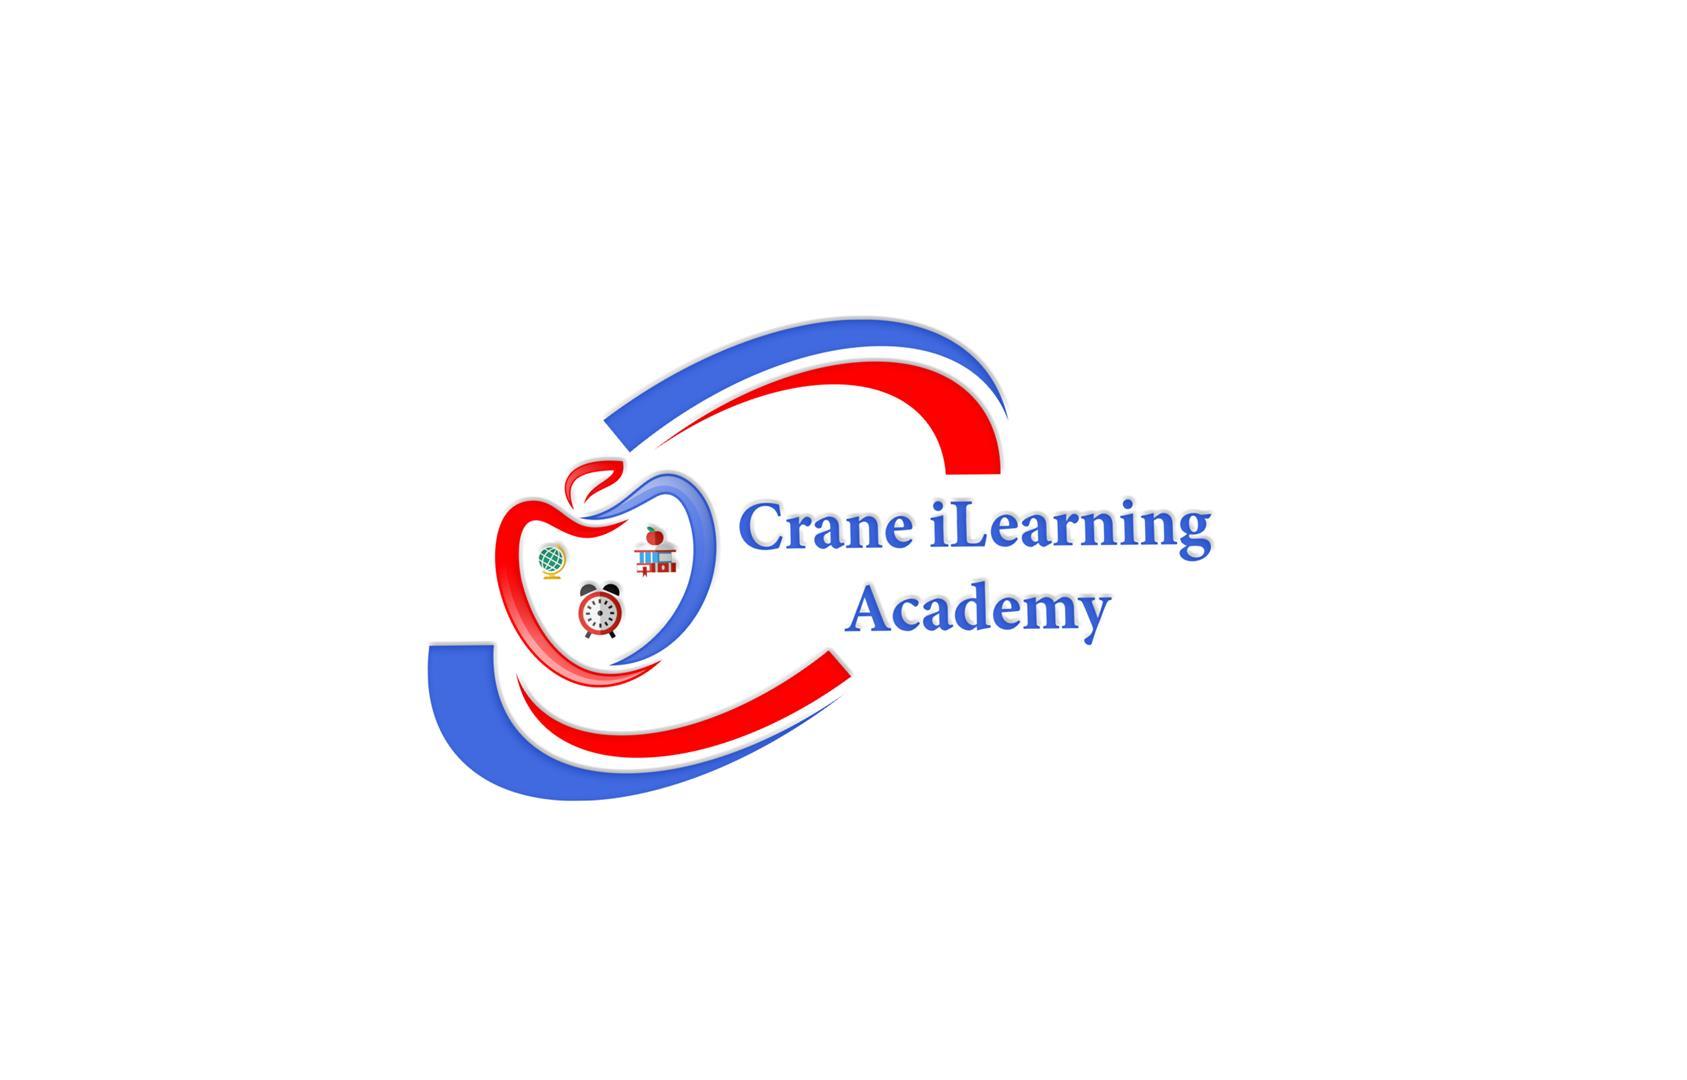 Crane iLearning Academy Logo